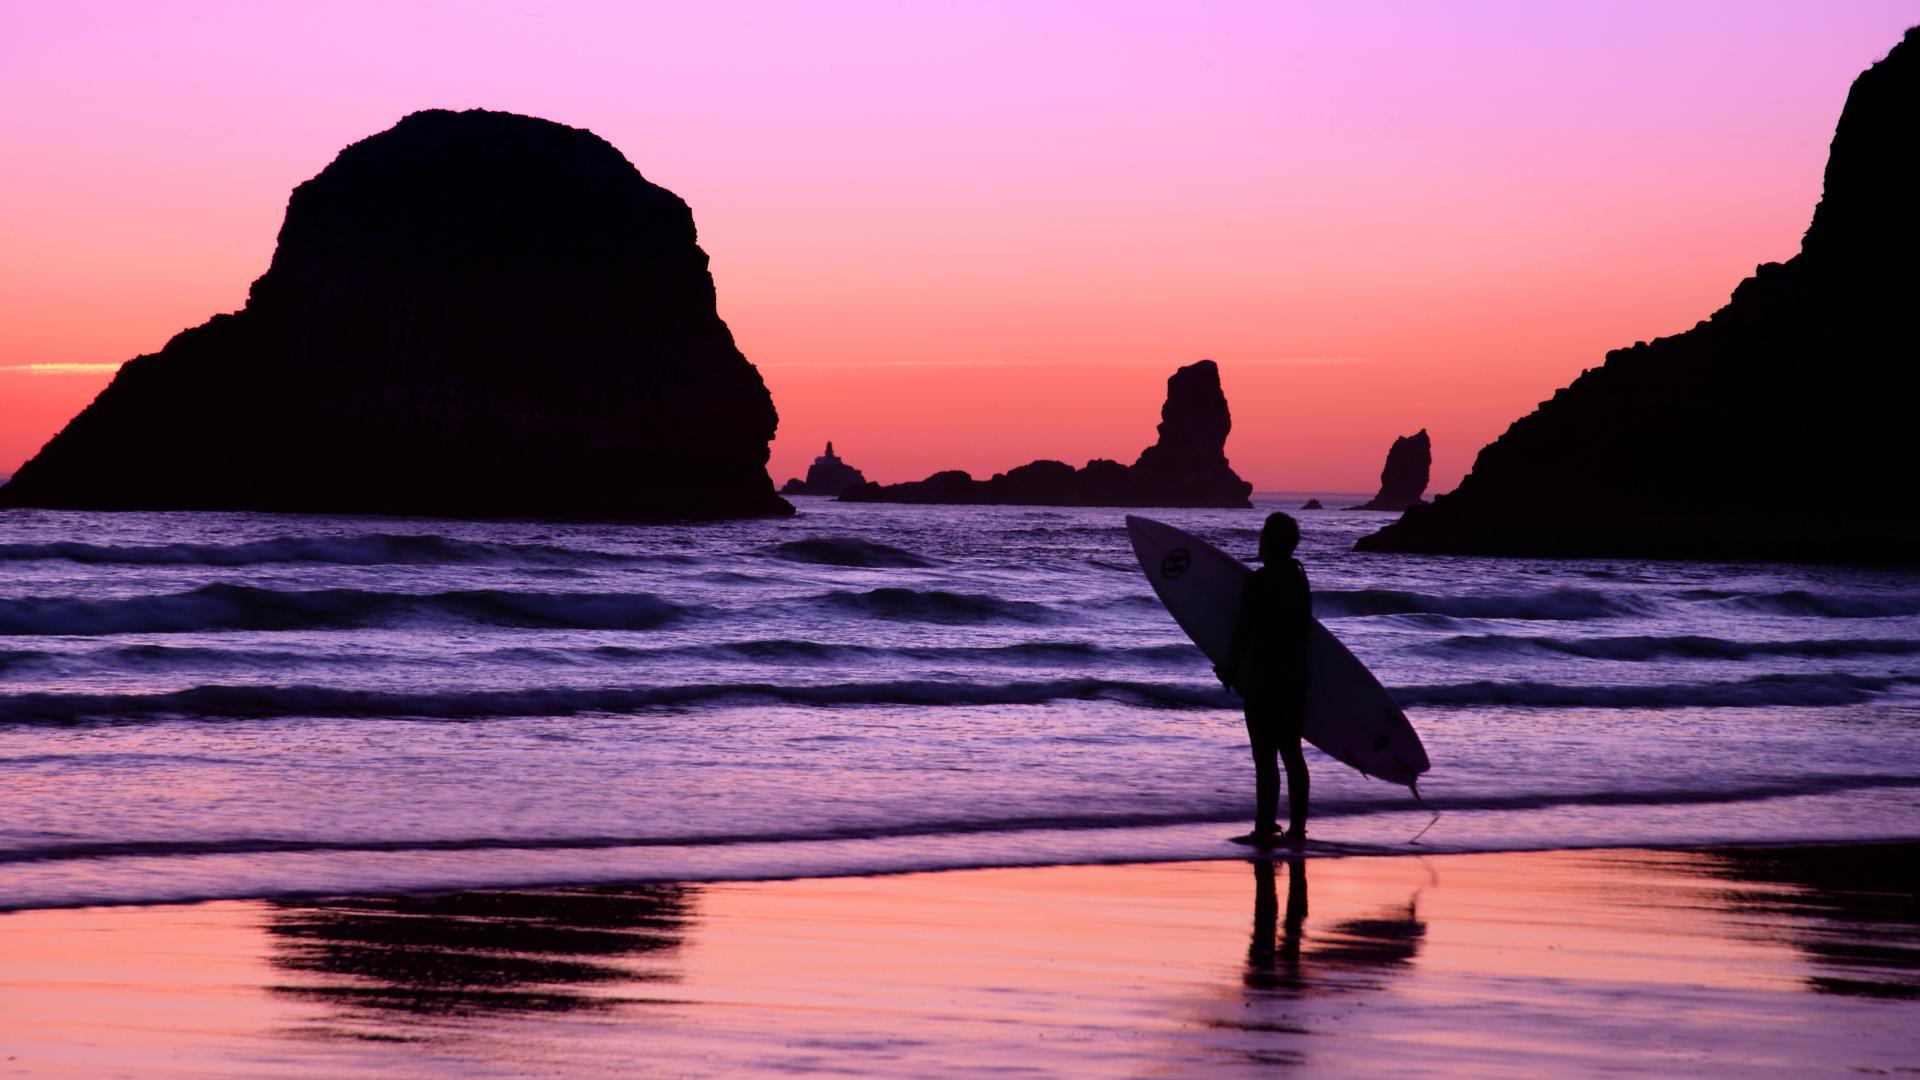 hawaii beach surf #6